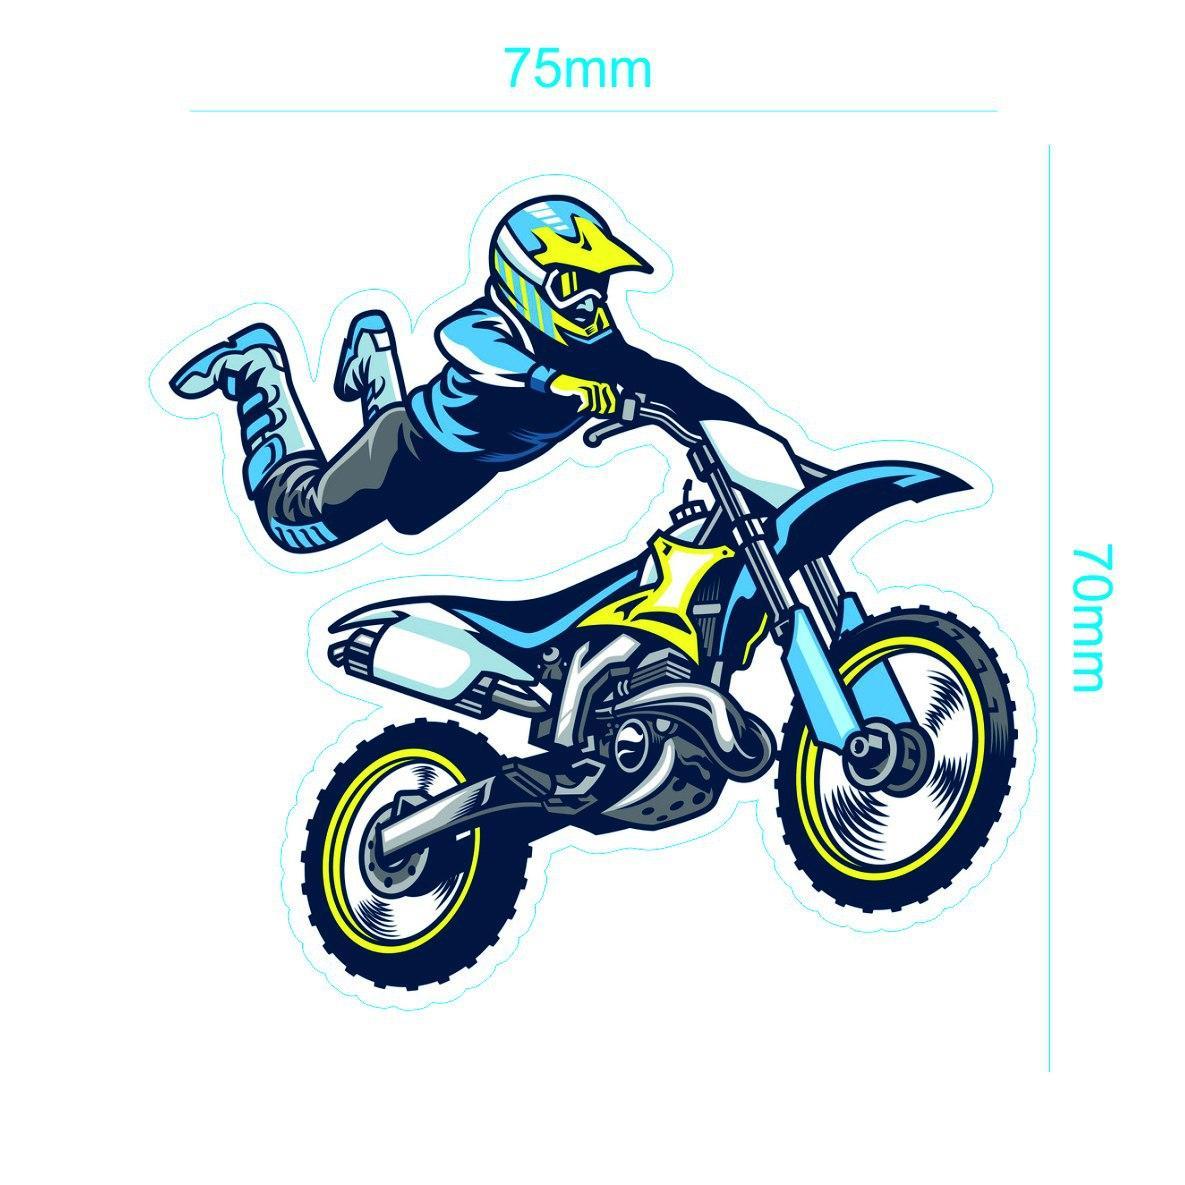 برچسب بدنه موتور سیکلت طرح MOTOR کد06